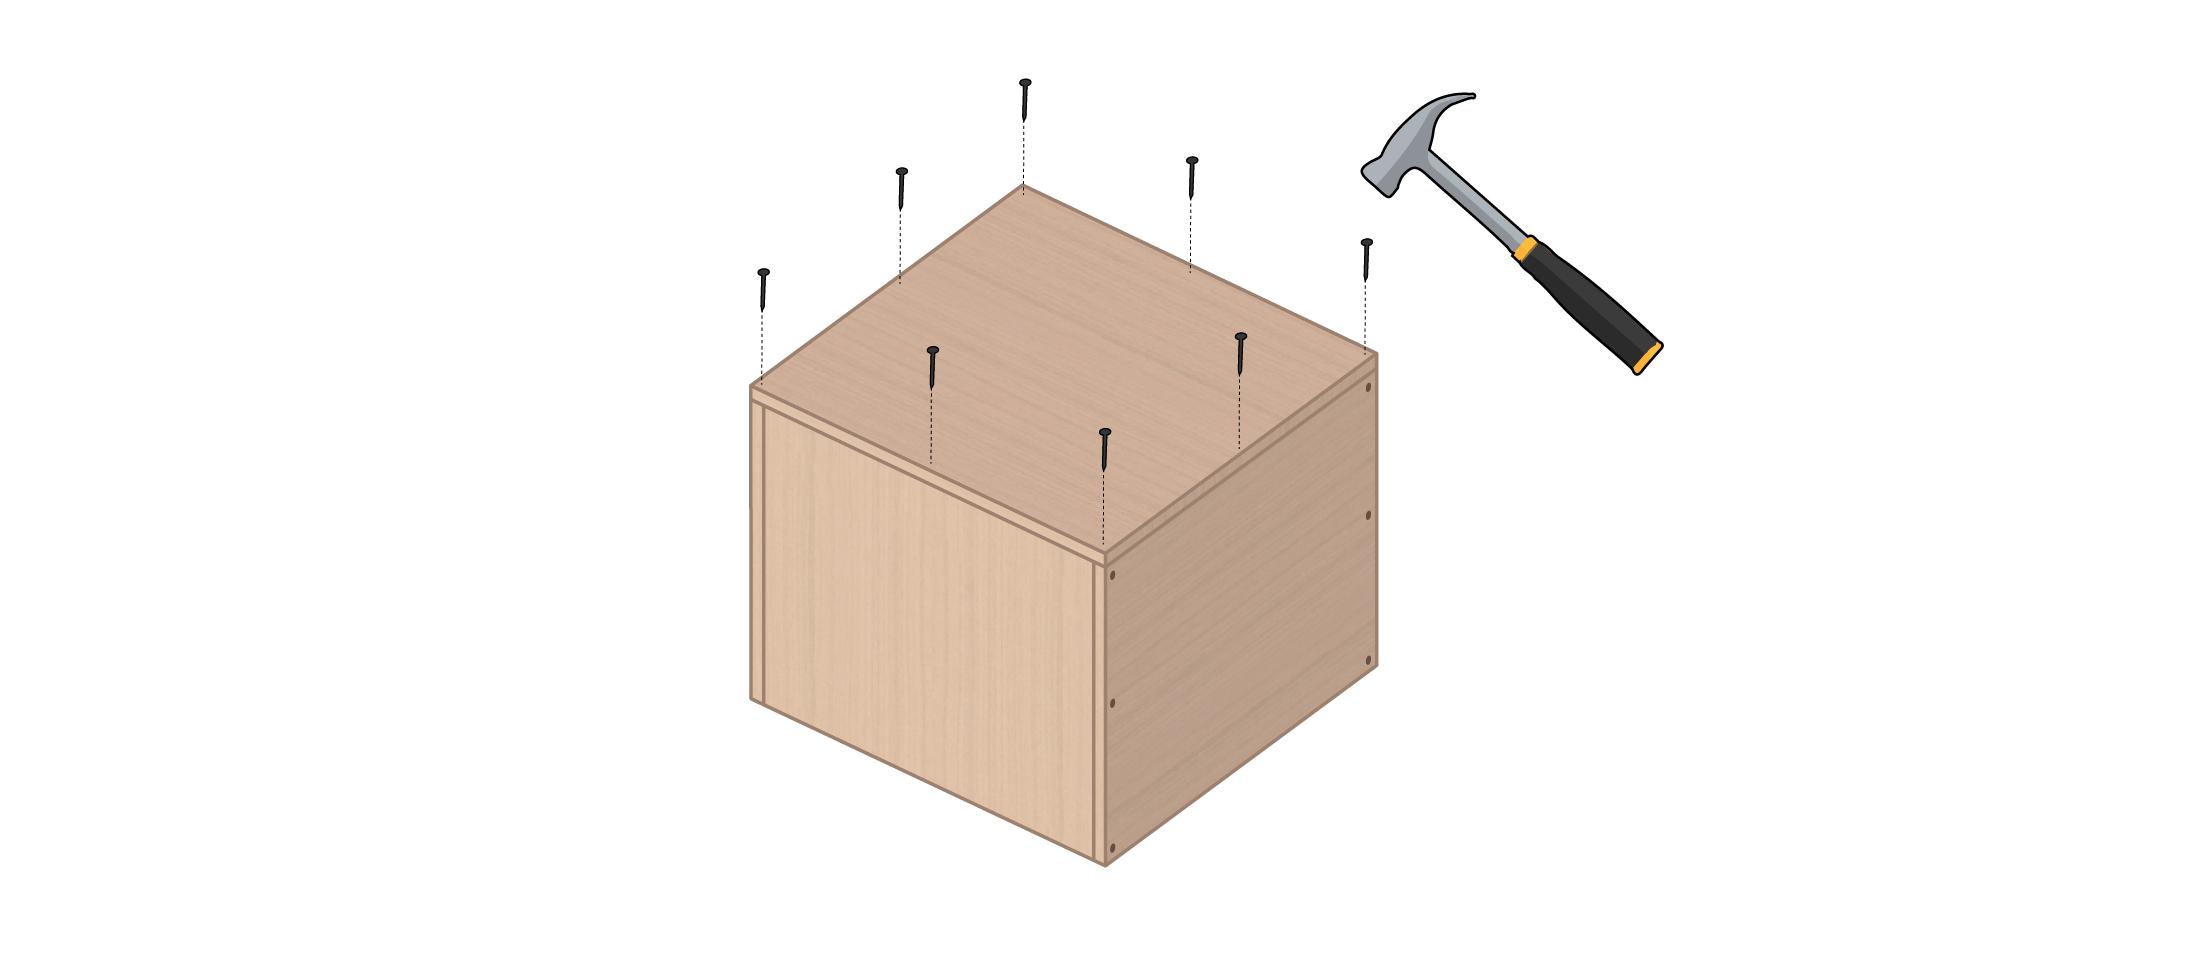 meuble vinyle DIY étape 5